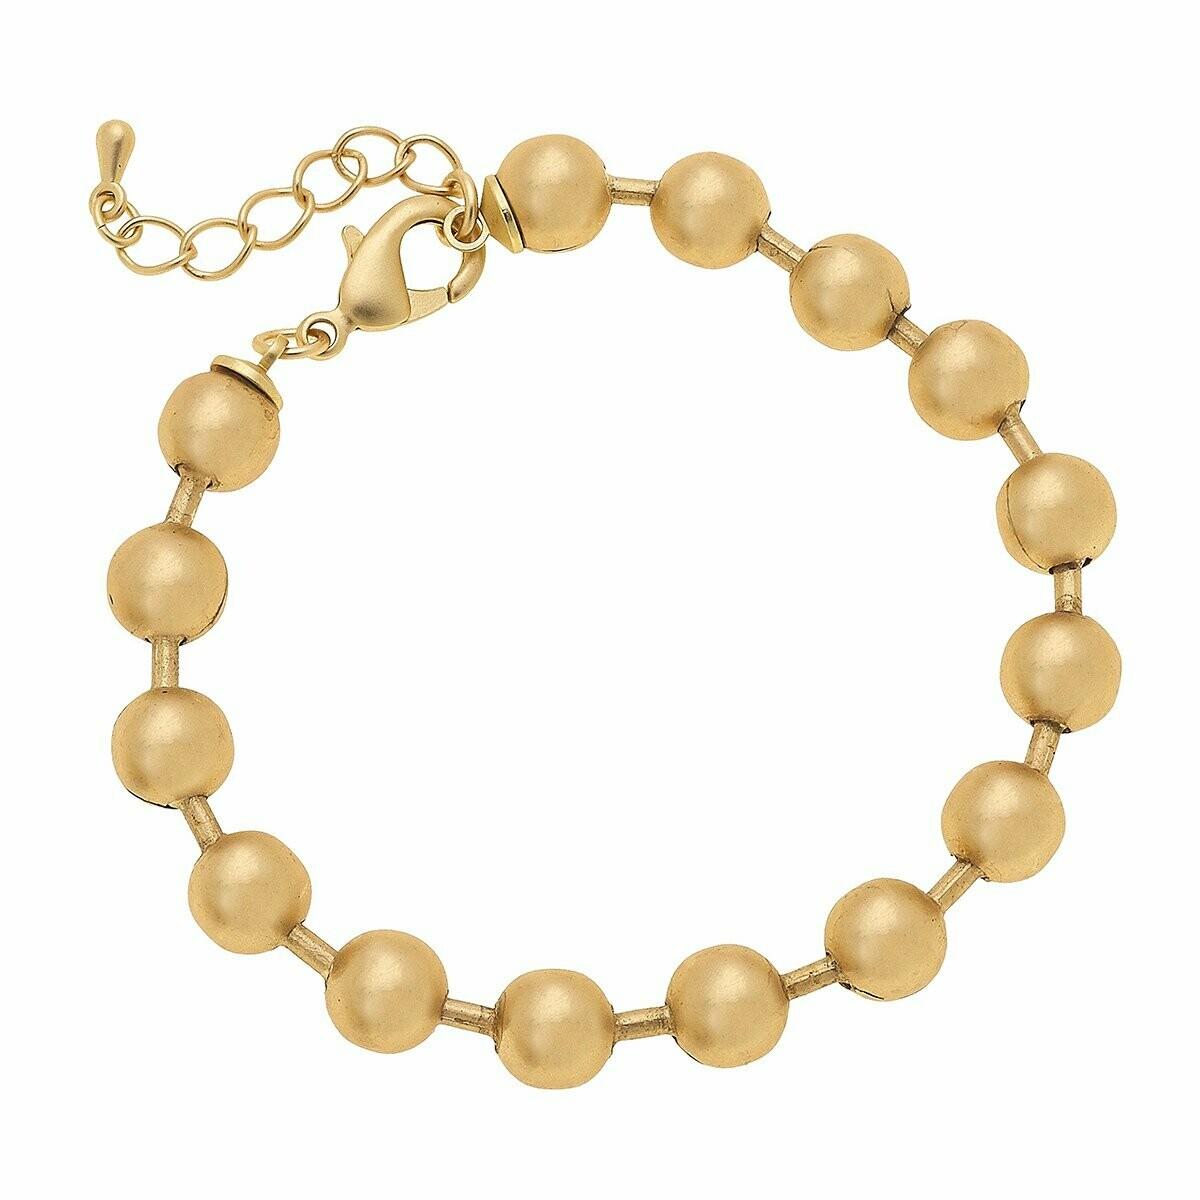 Juni Ball Chain Bracelet in Matte Gold